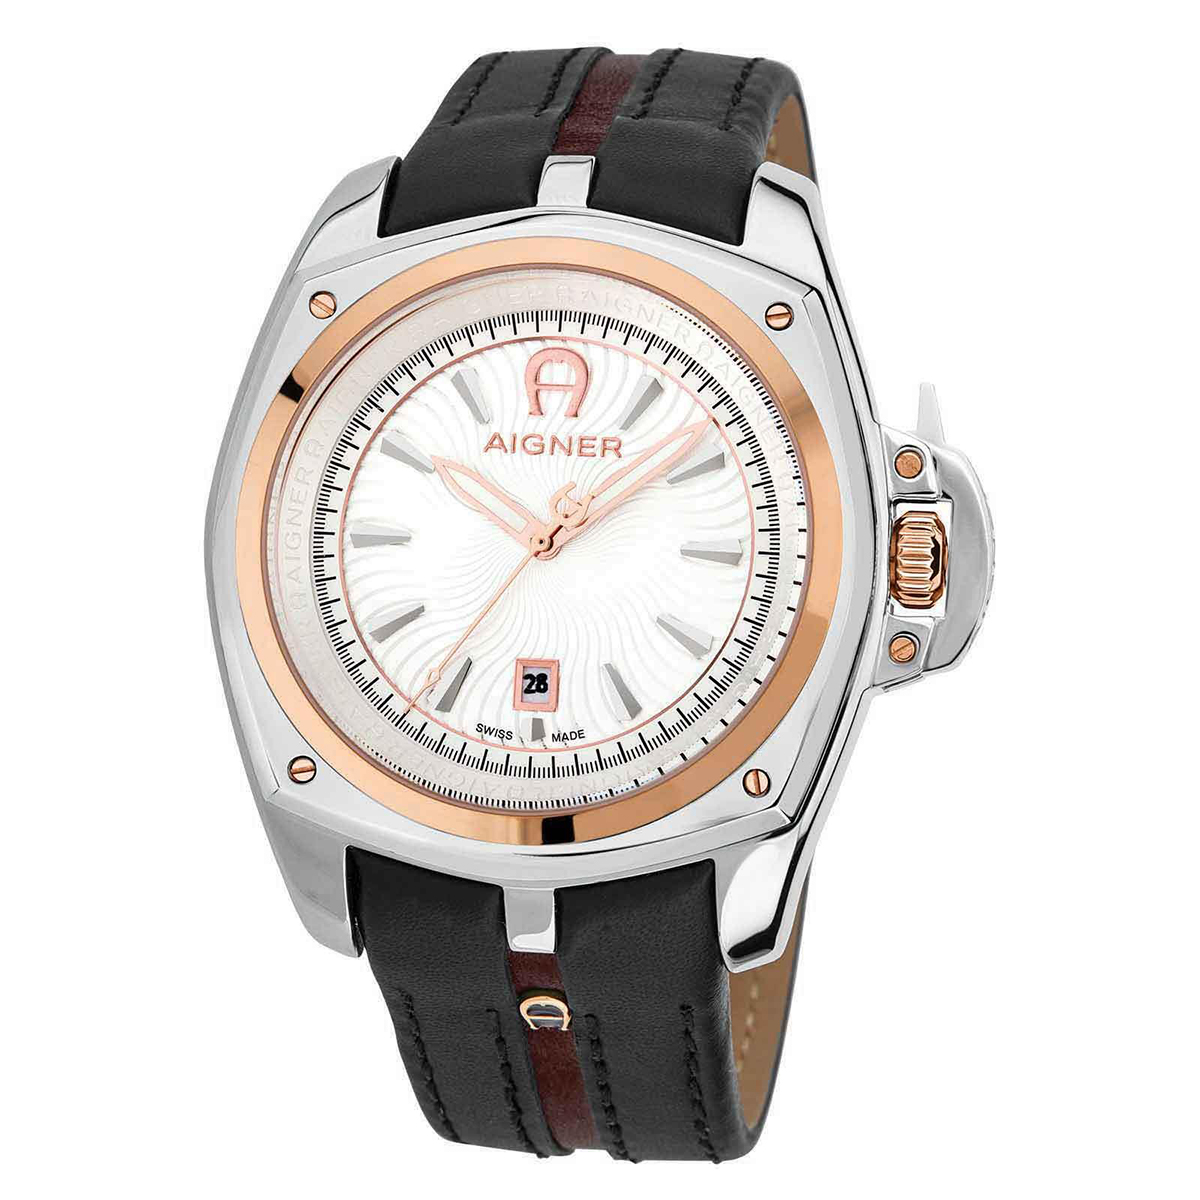 ساعت مچی عقربه ای مردانه اگنر مدل A18128 42